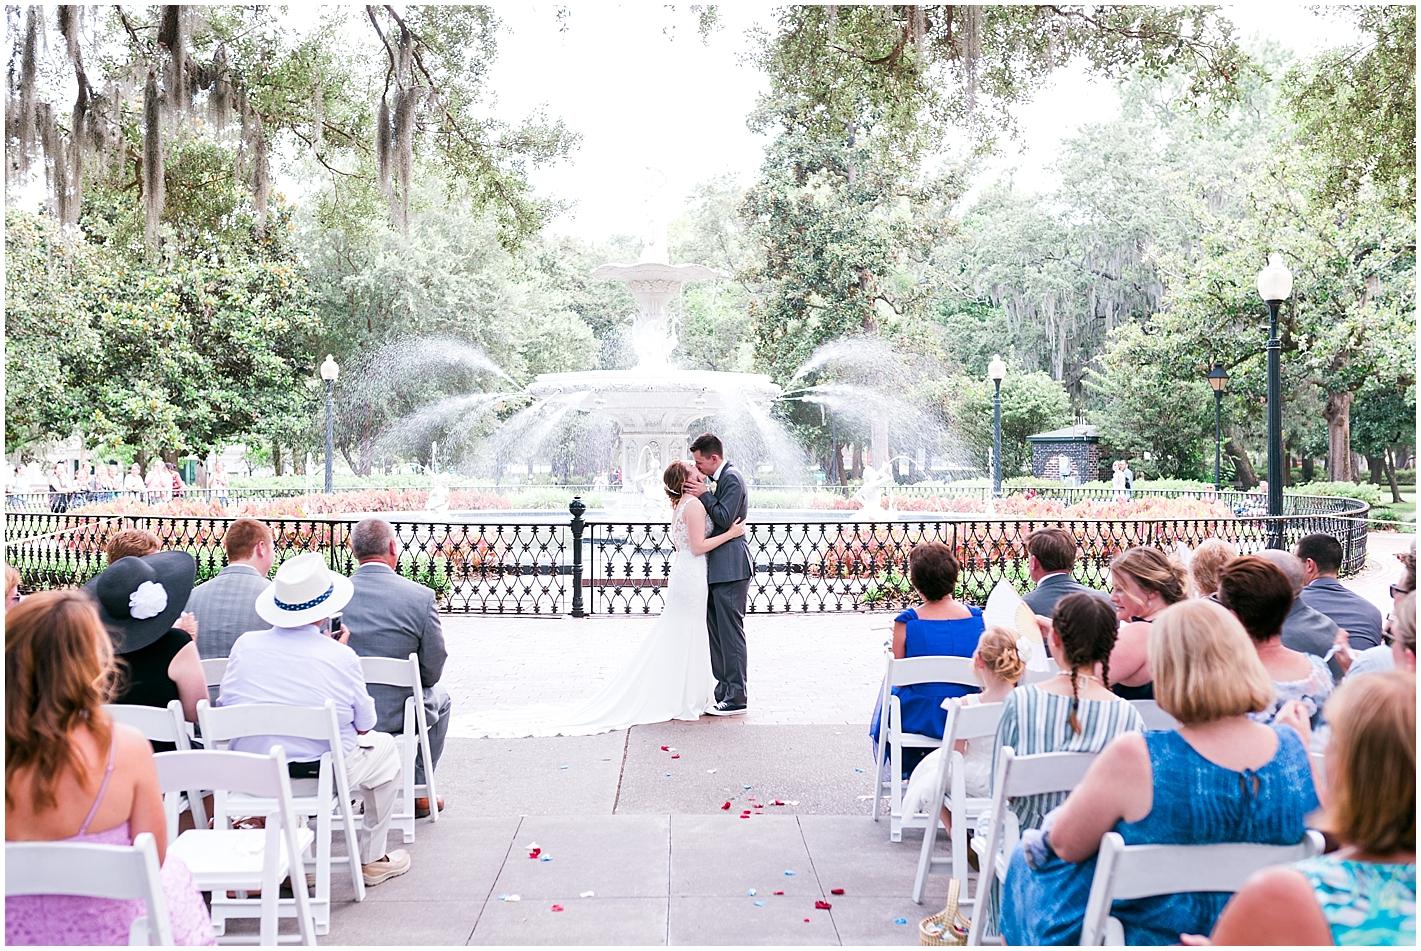 Forsyth Park Savannah GA Wedding Ceremony in July Photos by Alyssa Parker Photography